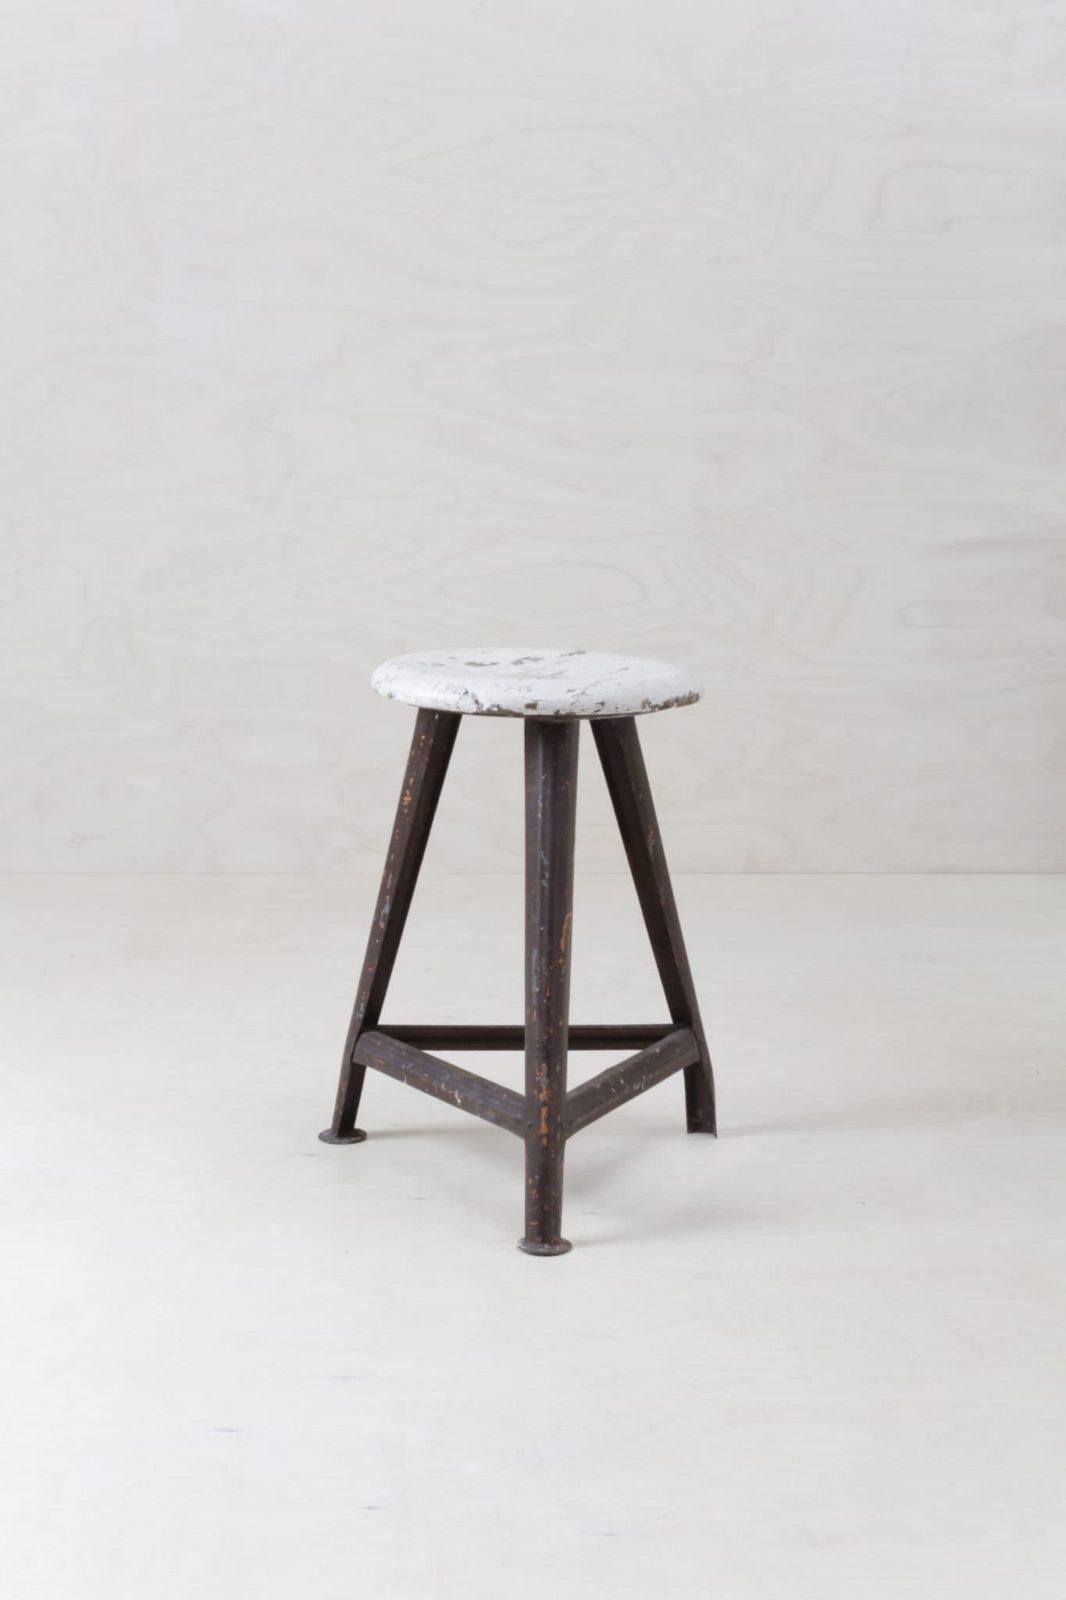 Stool Leya Vintage Rowac | Original Rowac Stool for a nice industrial look. | gotvintage Rental & Event Design